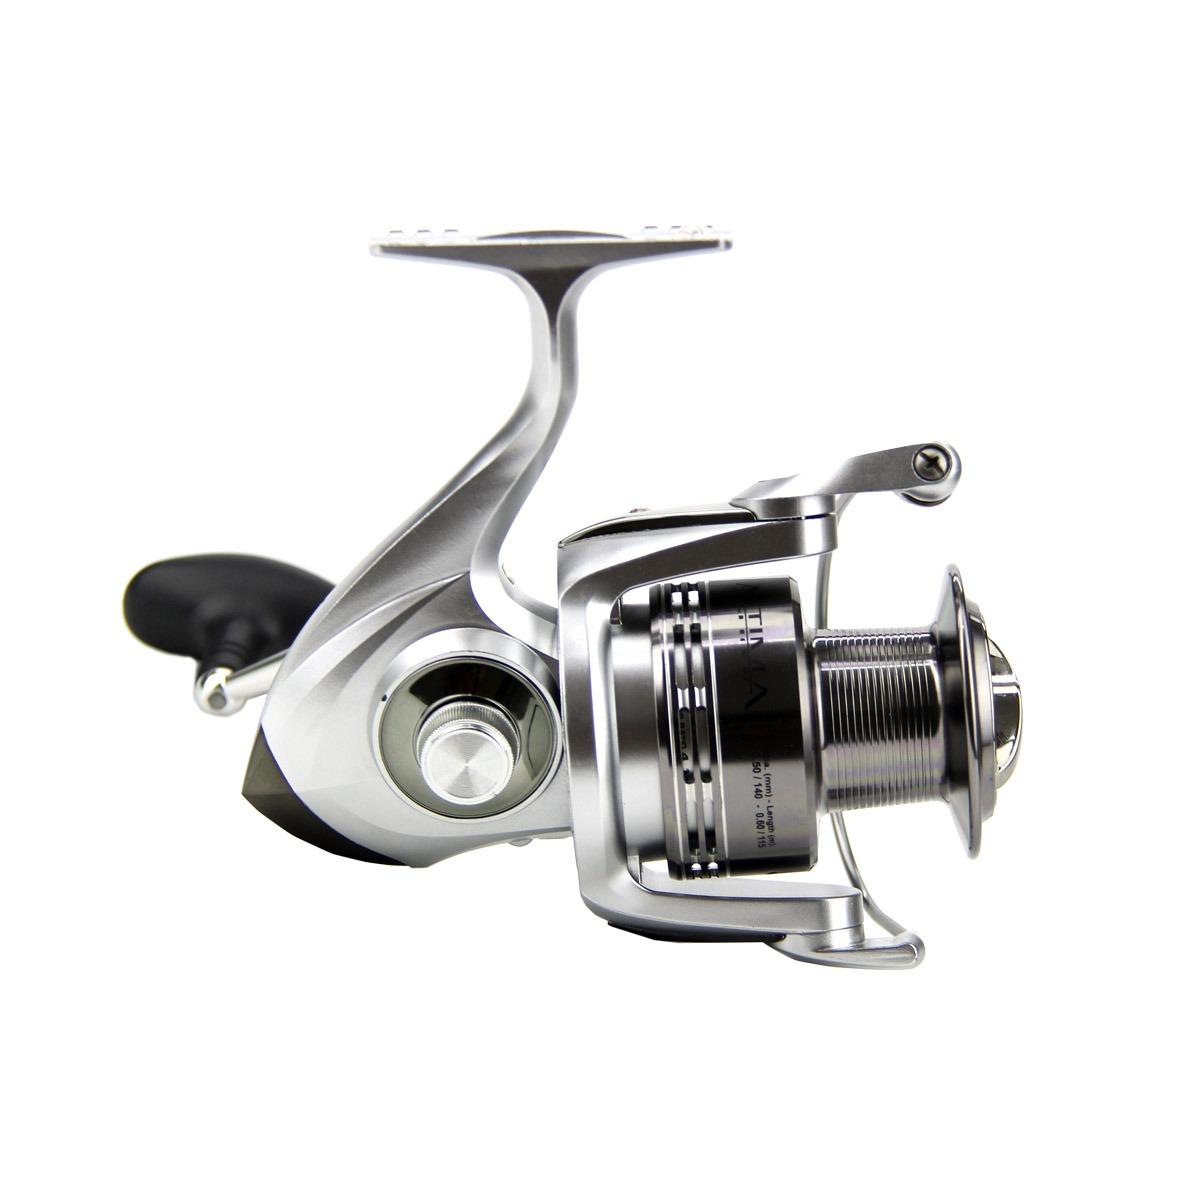 Molinete Marine Sports Altima Novo  - Comprando & Pescando